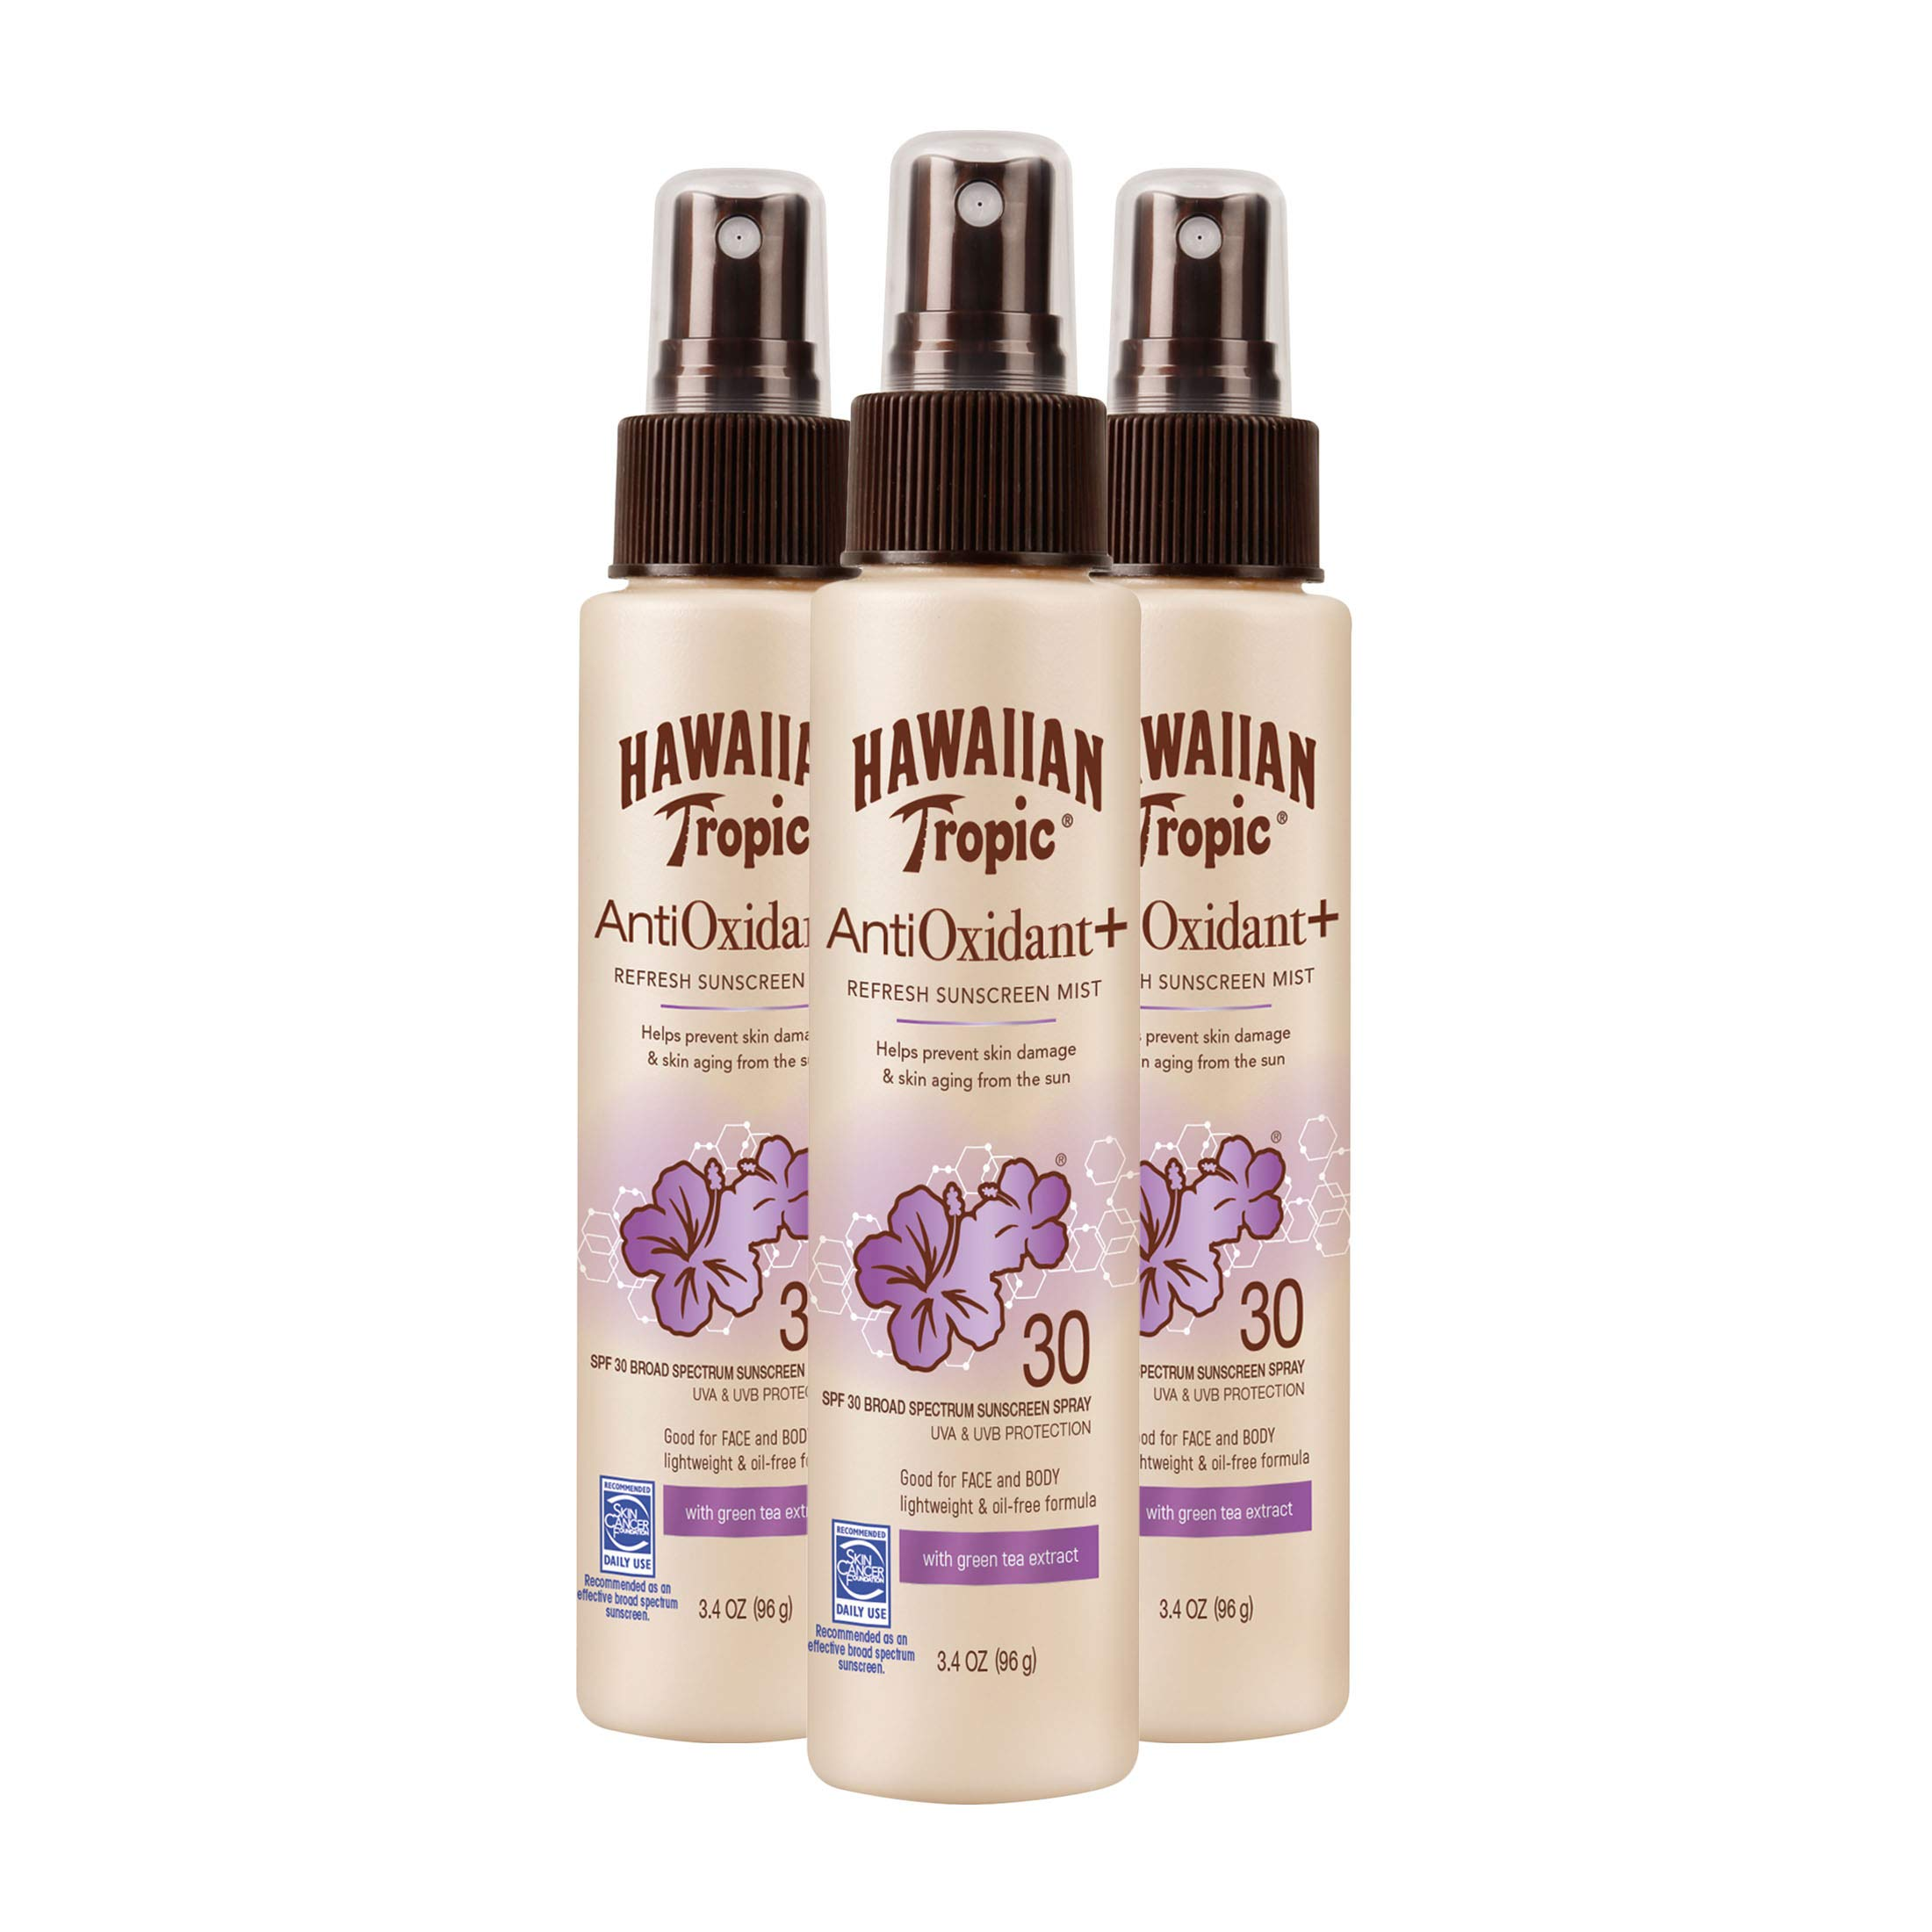 Hawaiian Tropic Antioxidant Sunscreen Extract